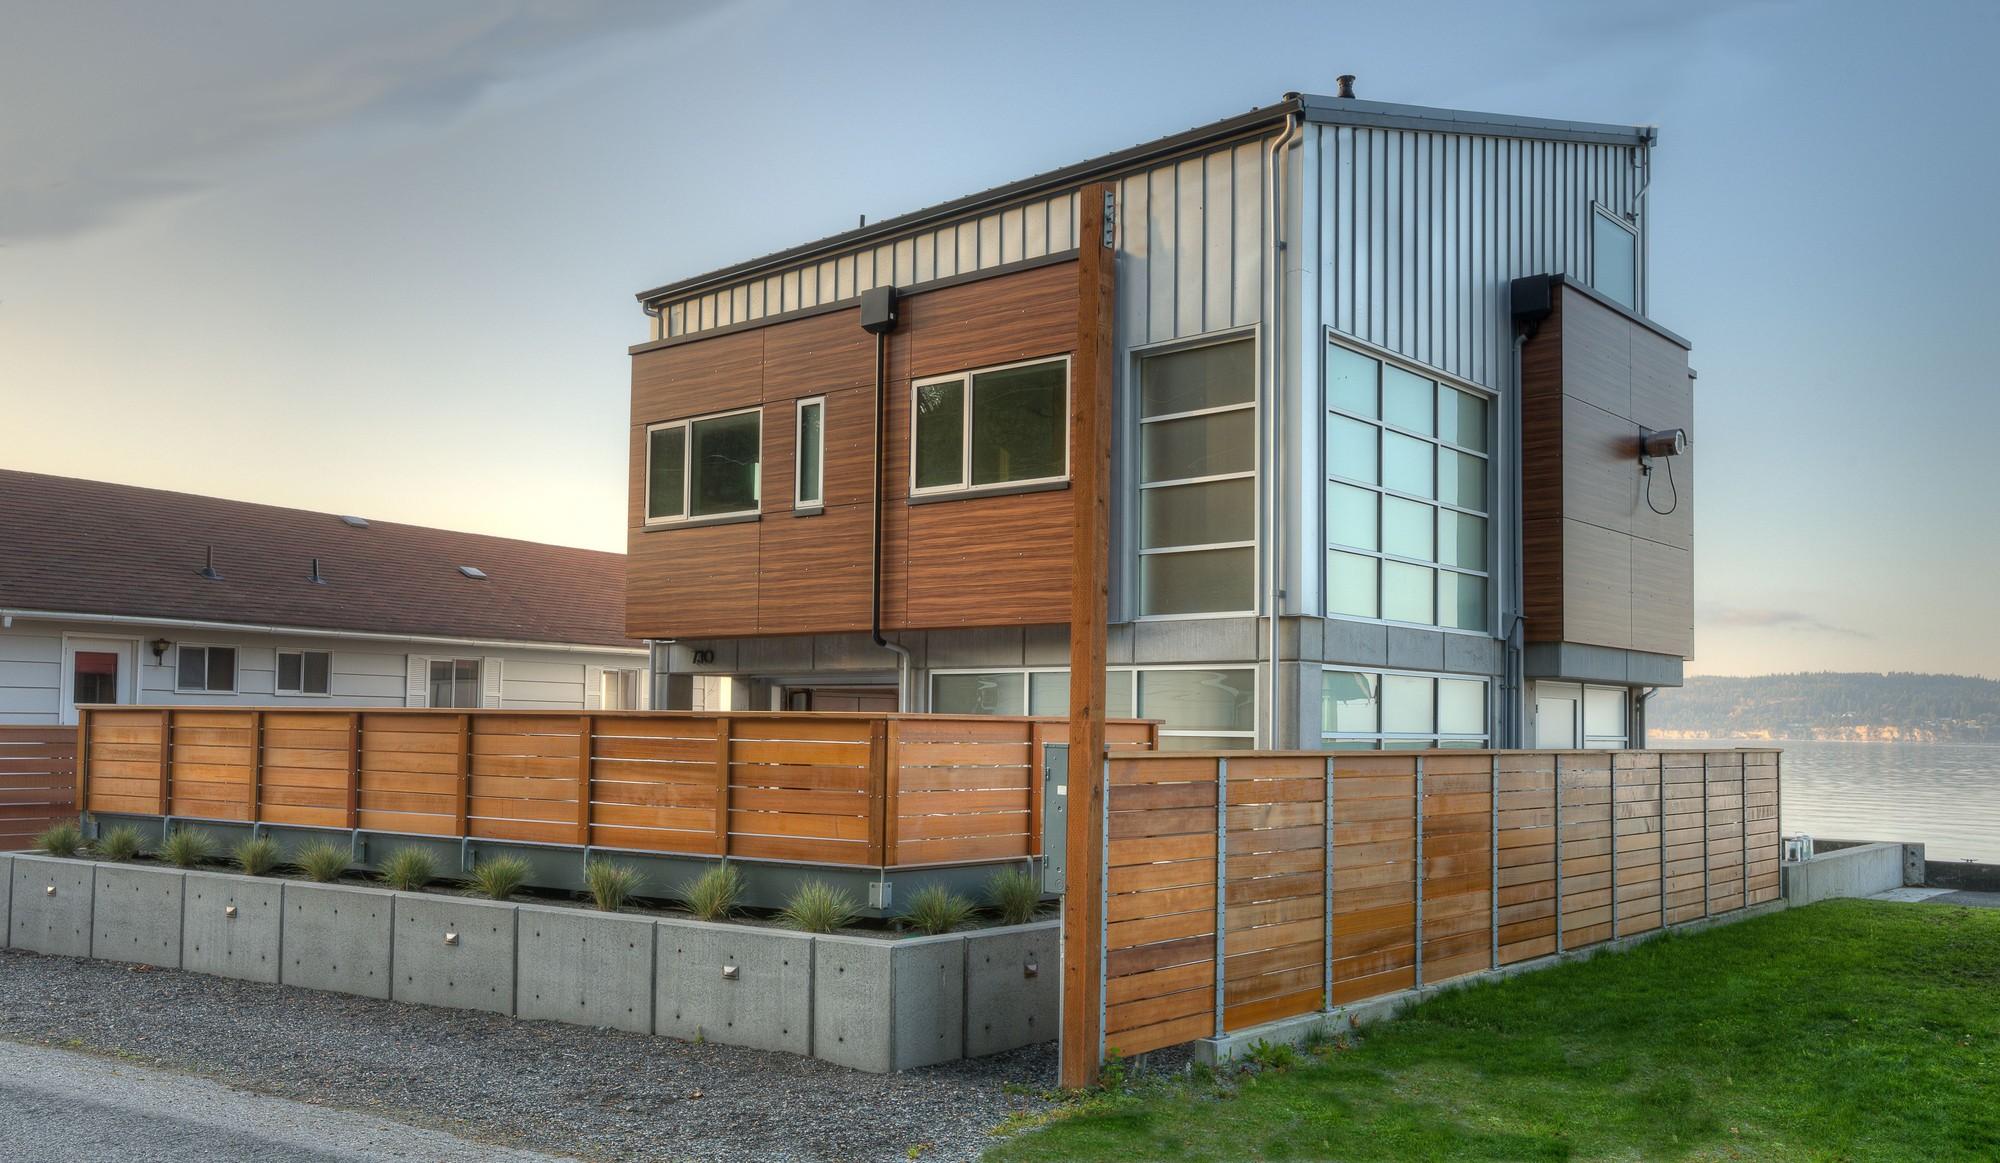 Tsunami Proof Building Design